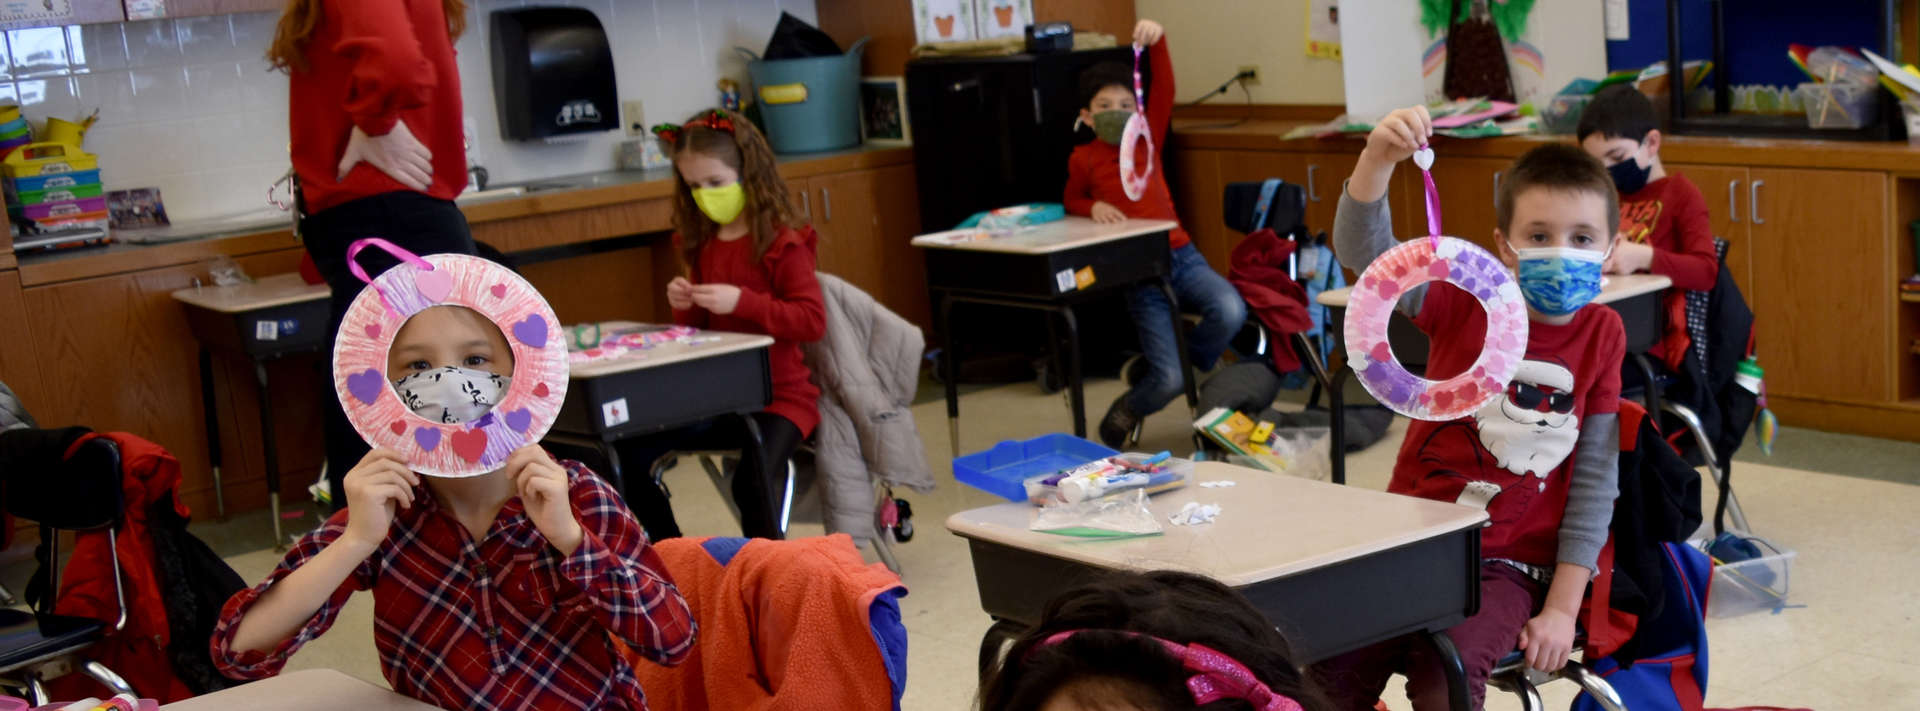 1st grade students show off their Valentine crafts